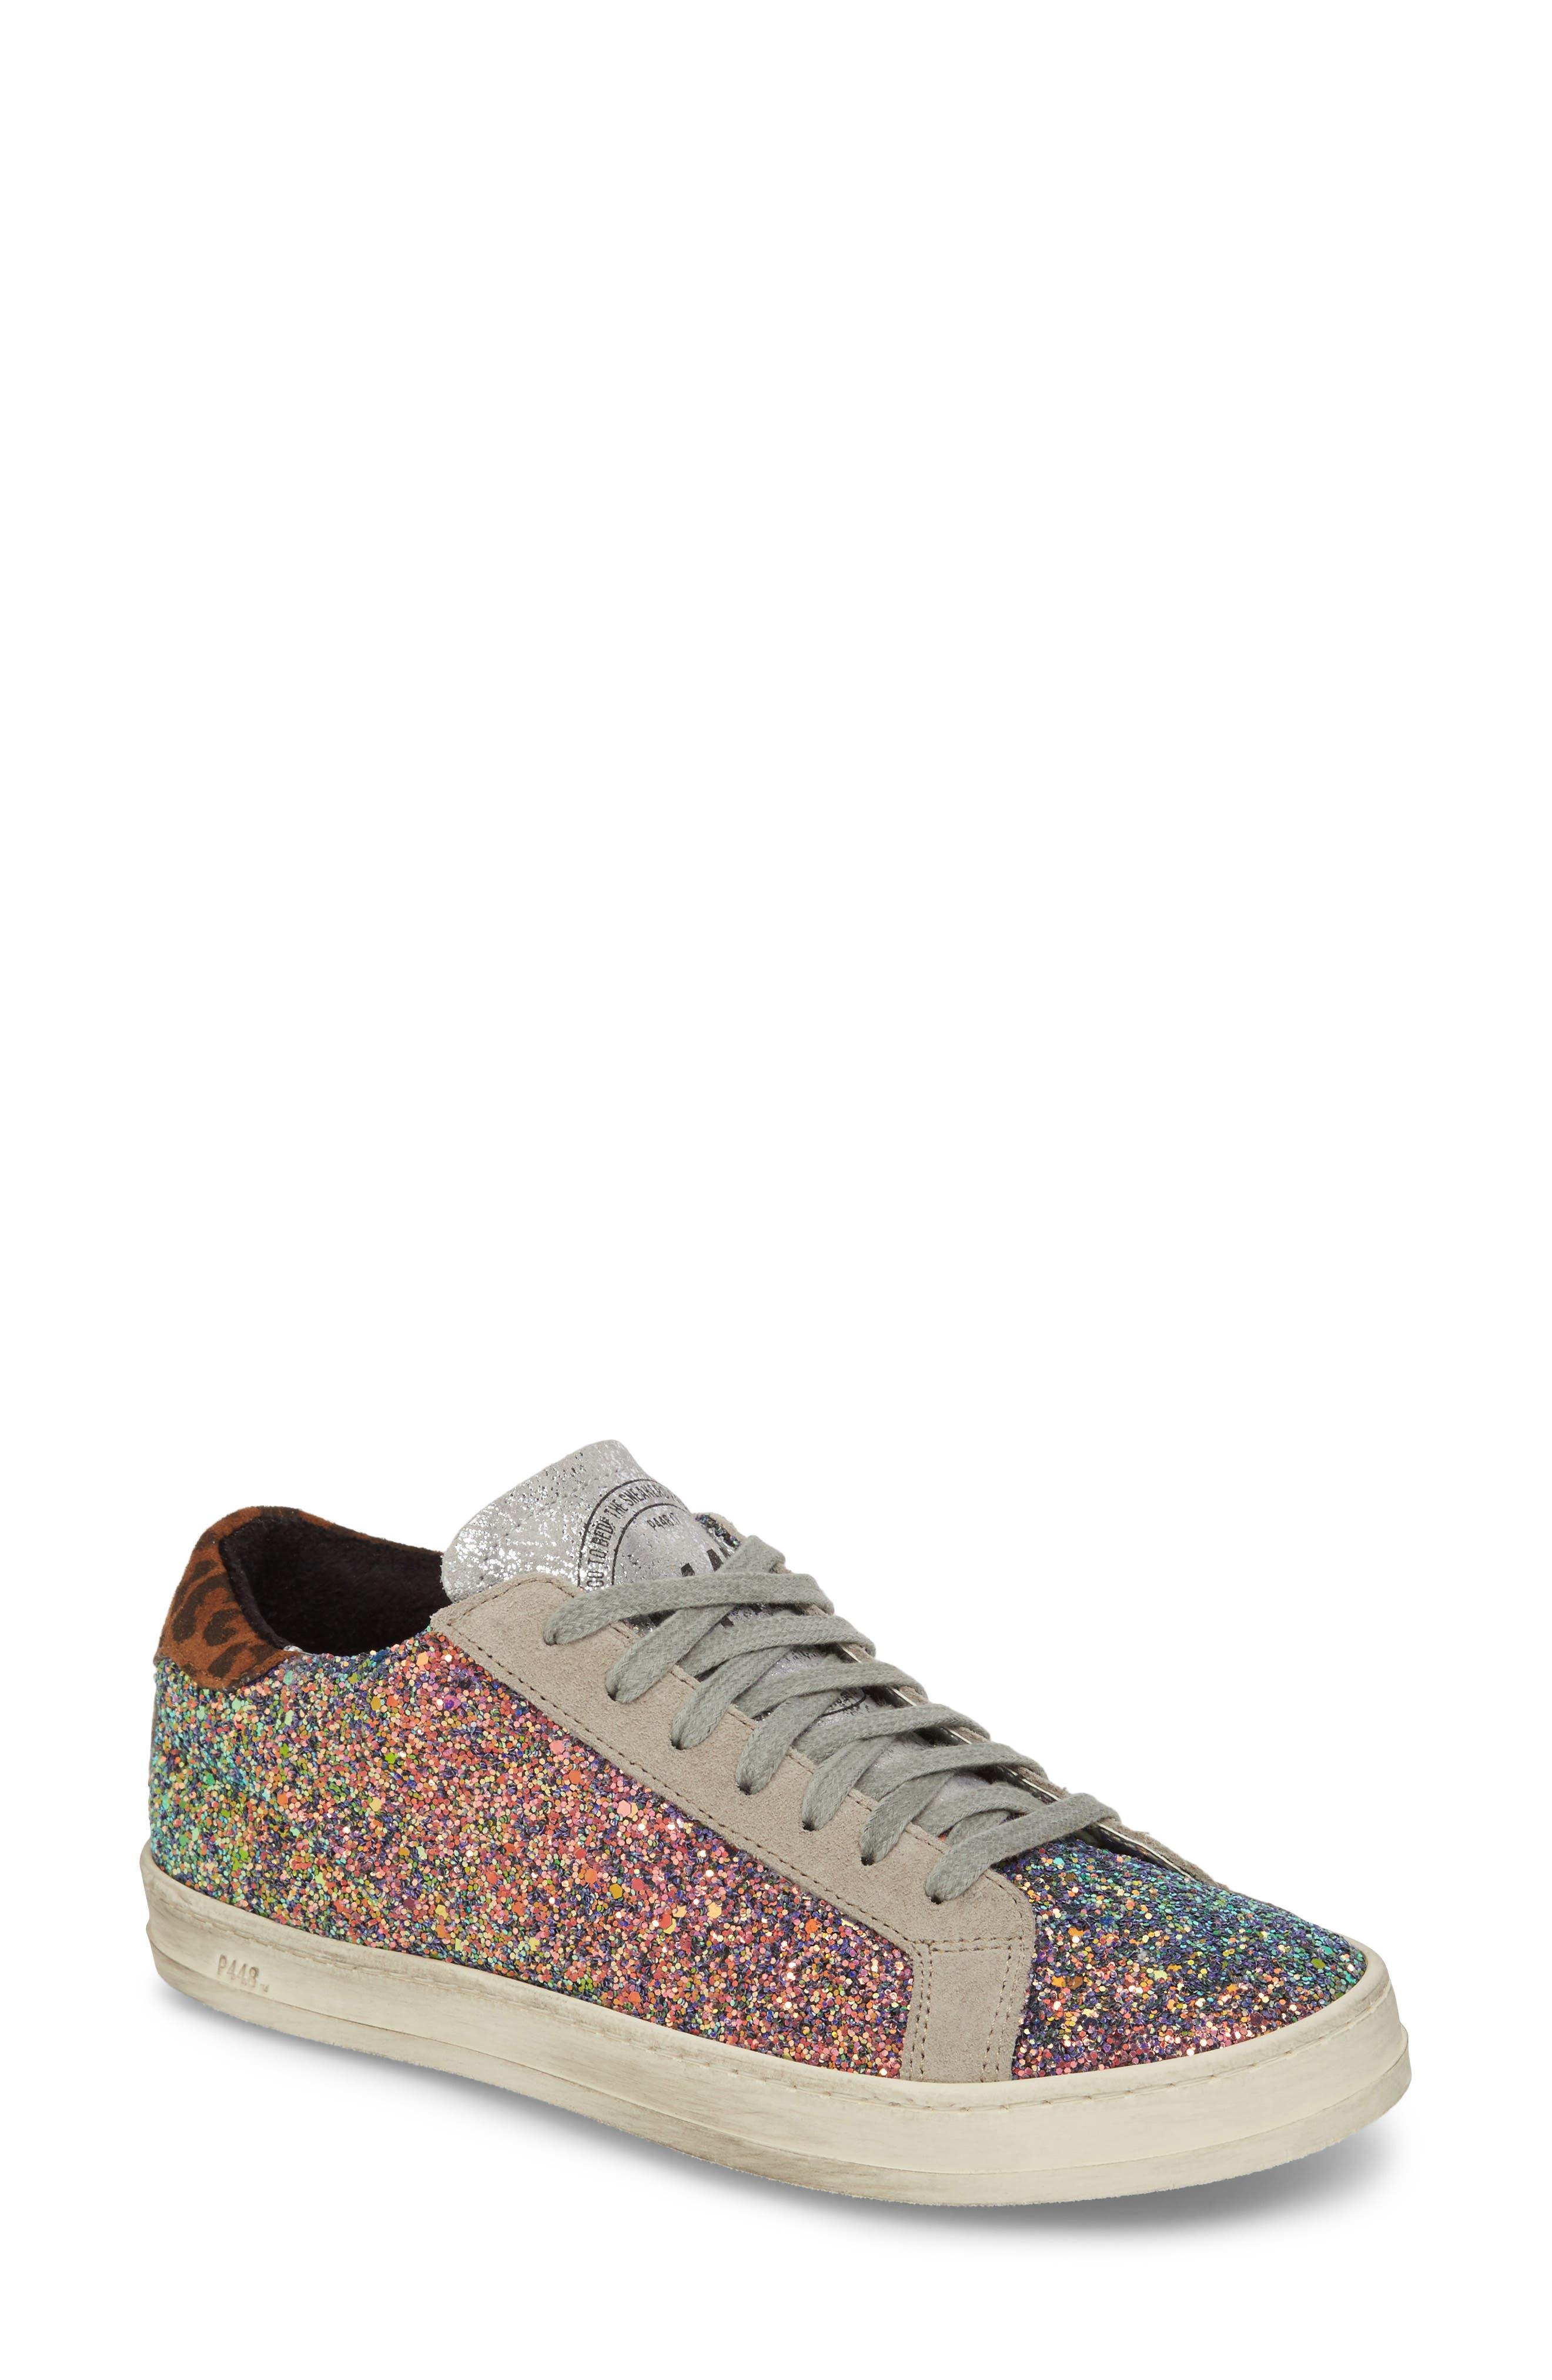 John Sneaker,                             Main thumbnail 1, color,                             Multicolor